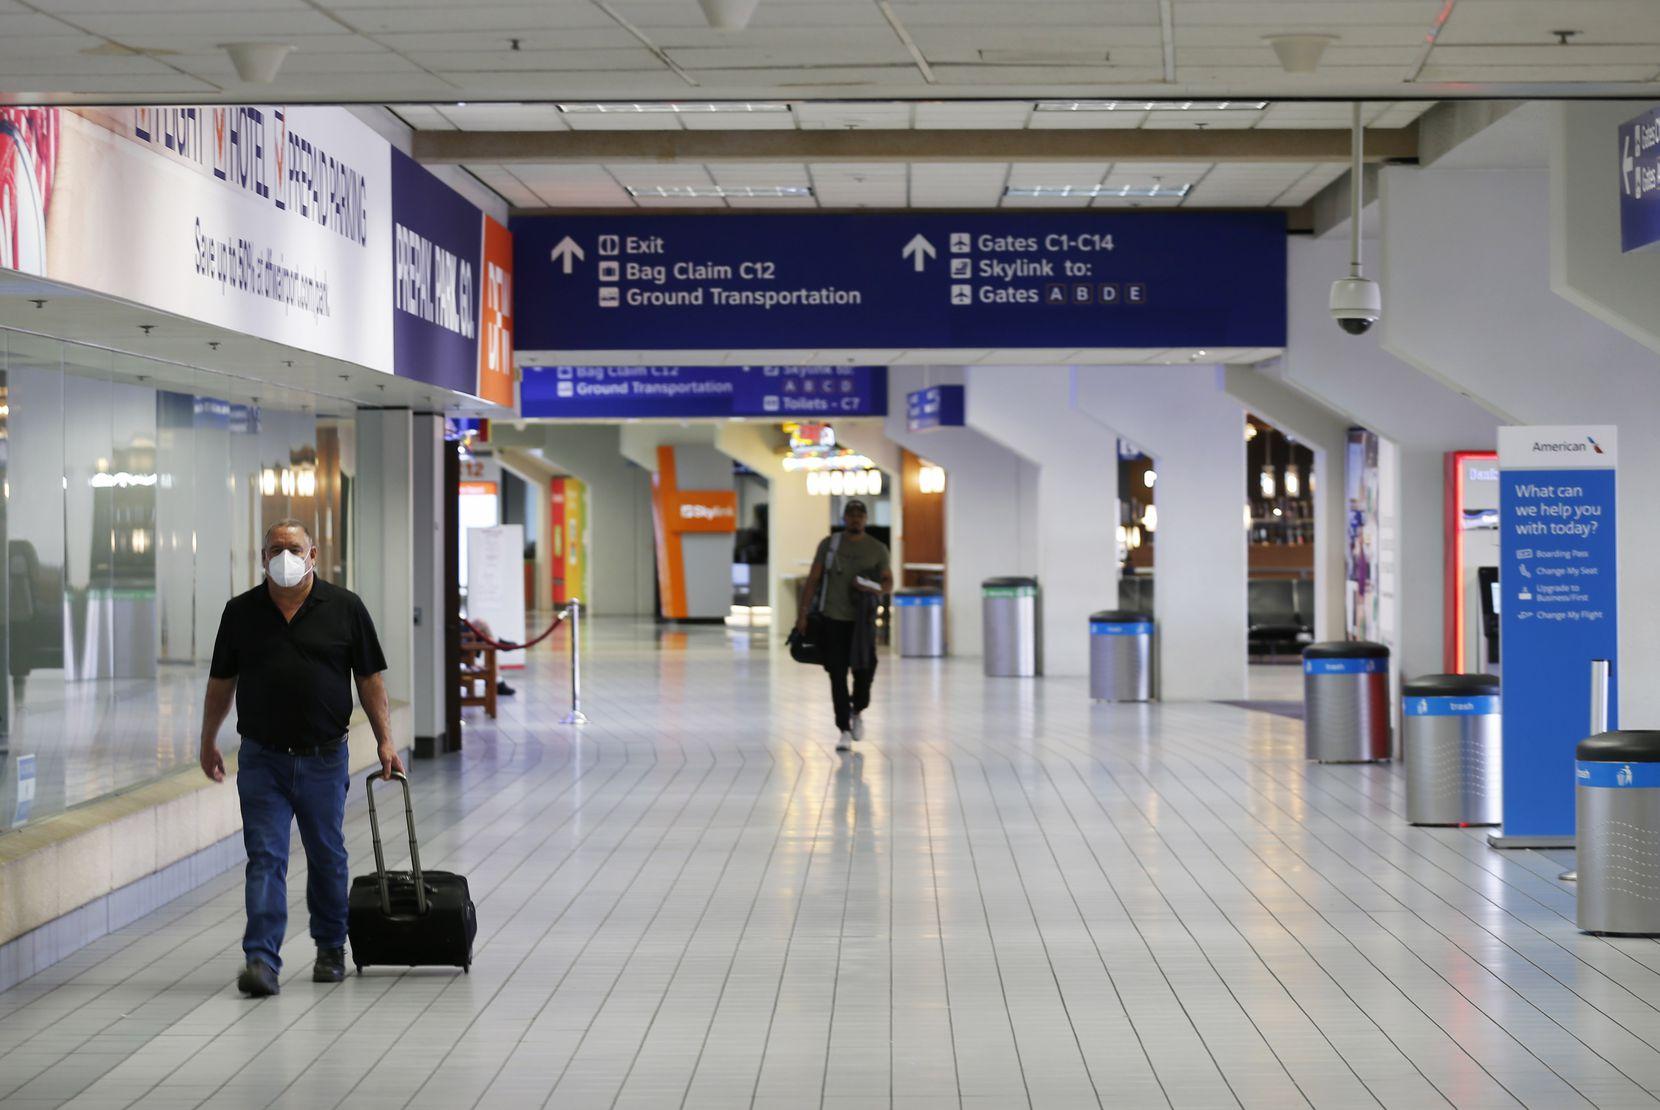 People make their way through terminal C at DFW International Airport on Wednesday, April 8, 2020.